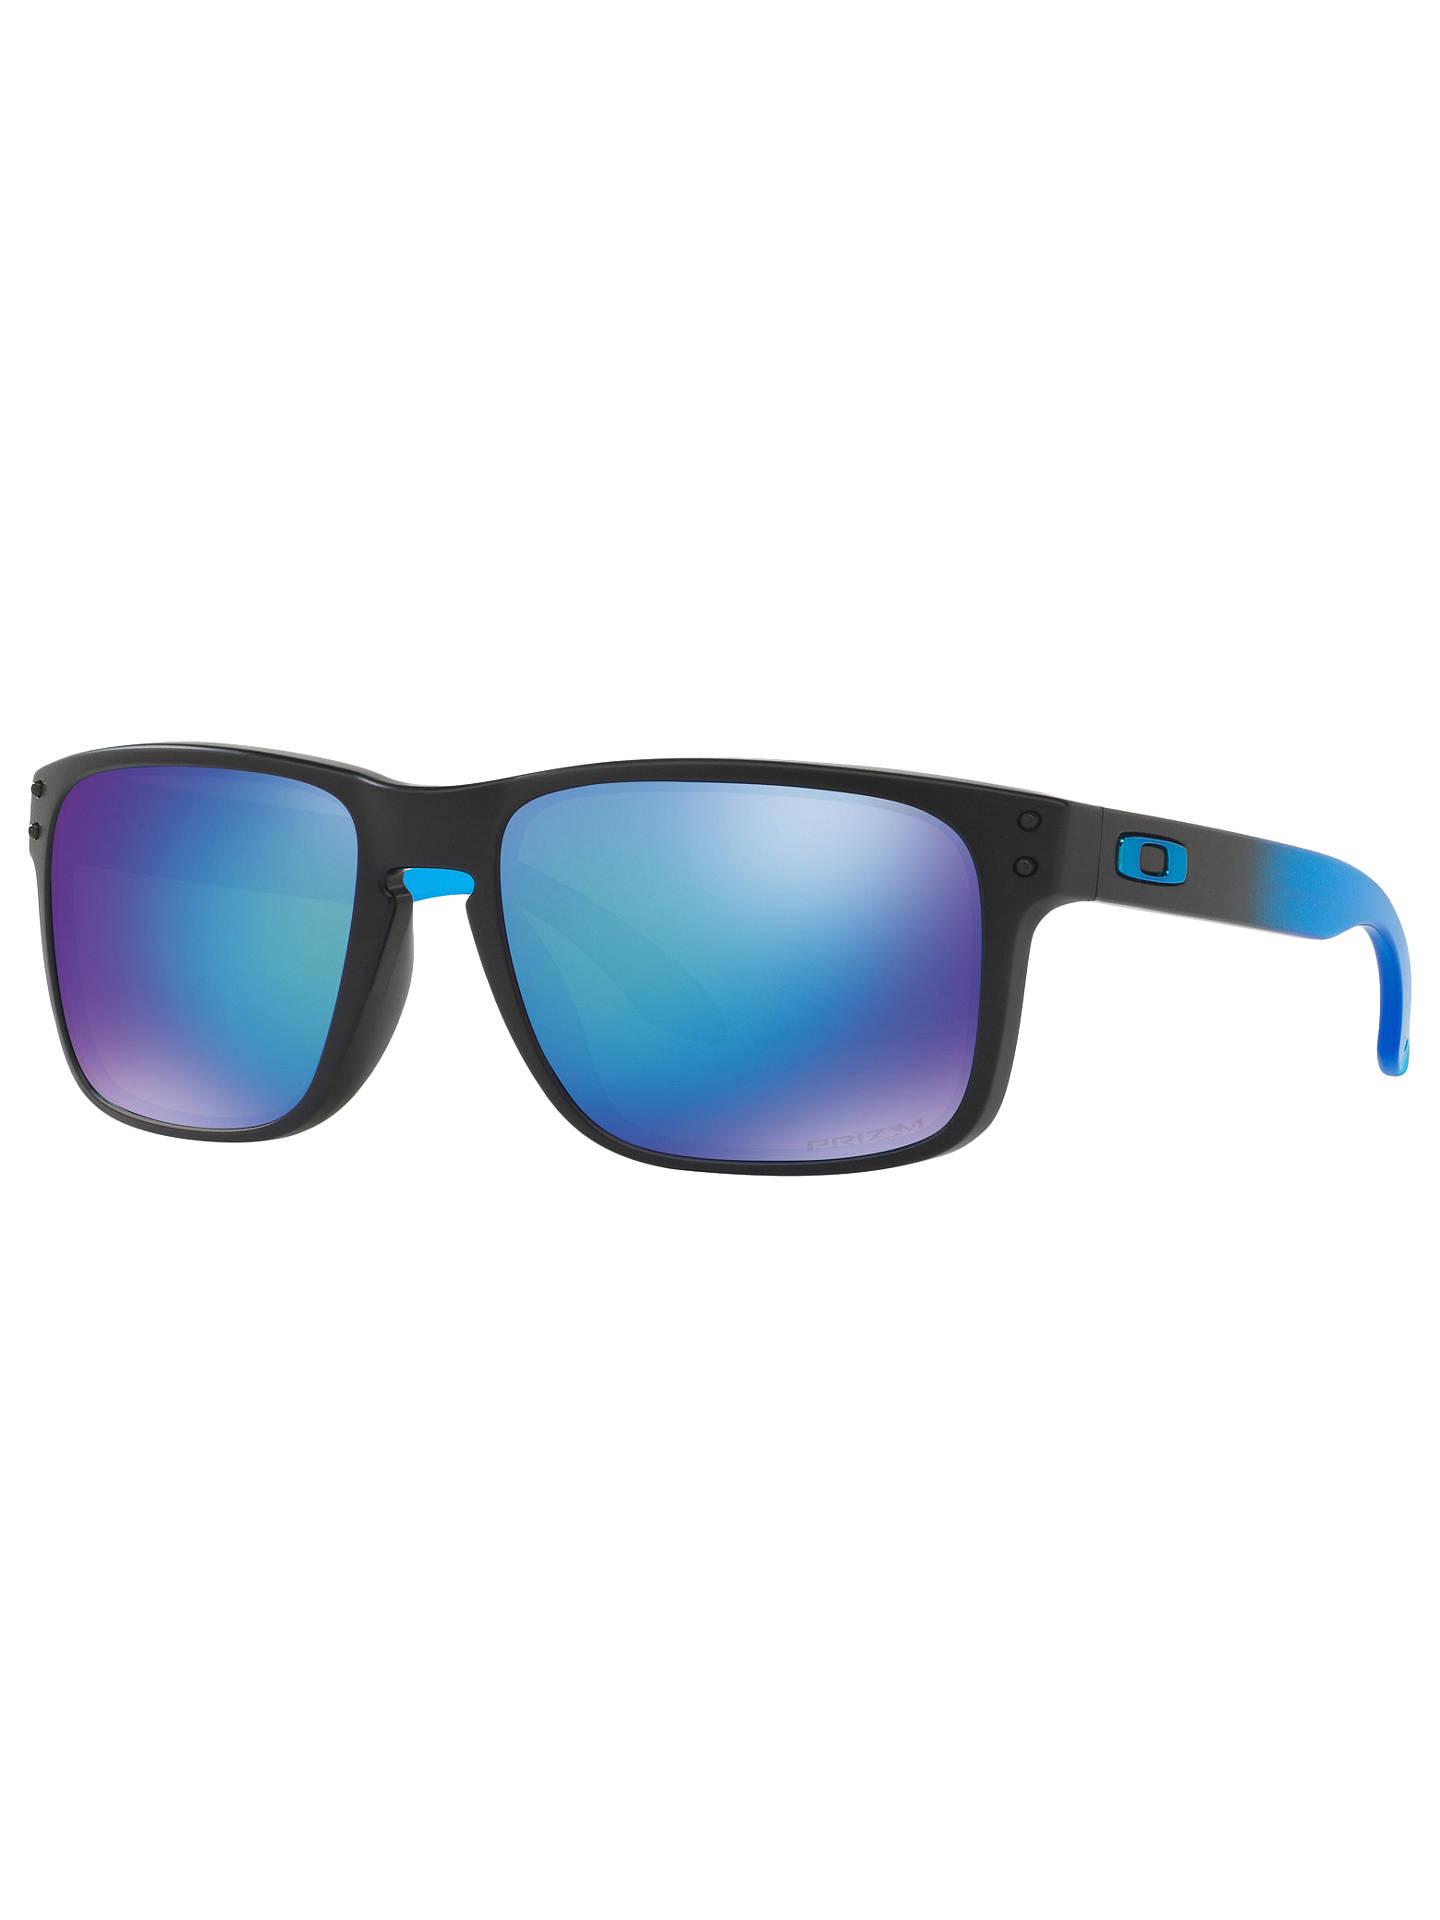 5c99e0df90 BuyOakley OO4123 Holbrook Prizm Polarised Square Sunglasses